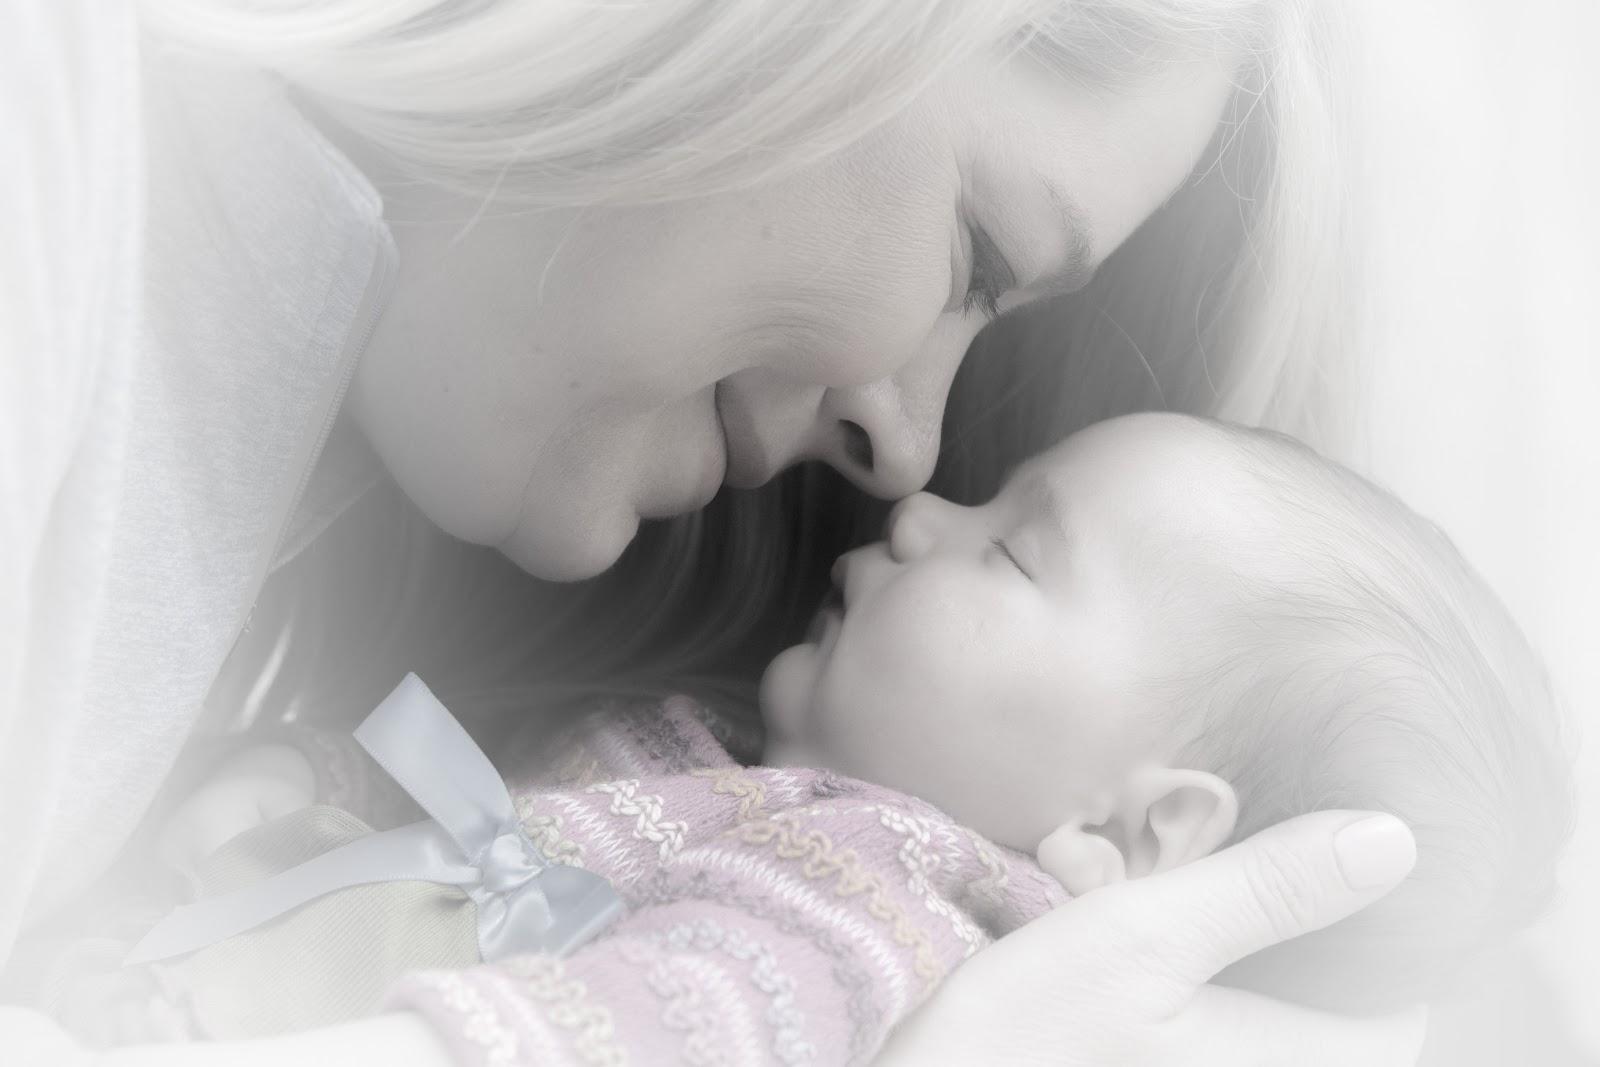 https://static.pexels.com/photos/38535/newborn-baby-mother-adorable-38535.jpeg